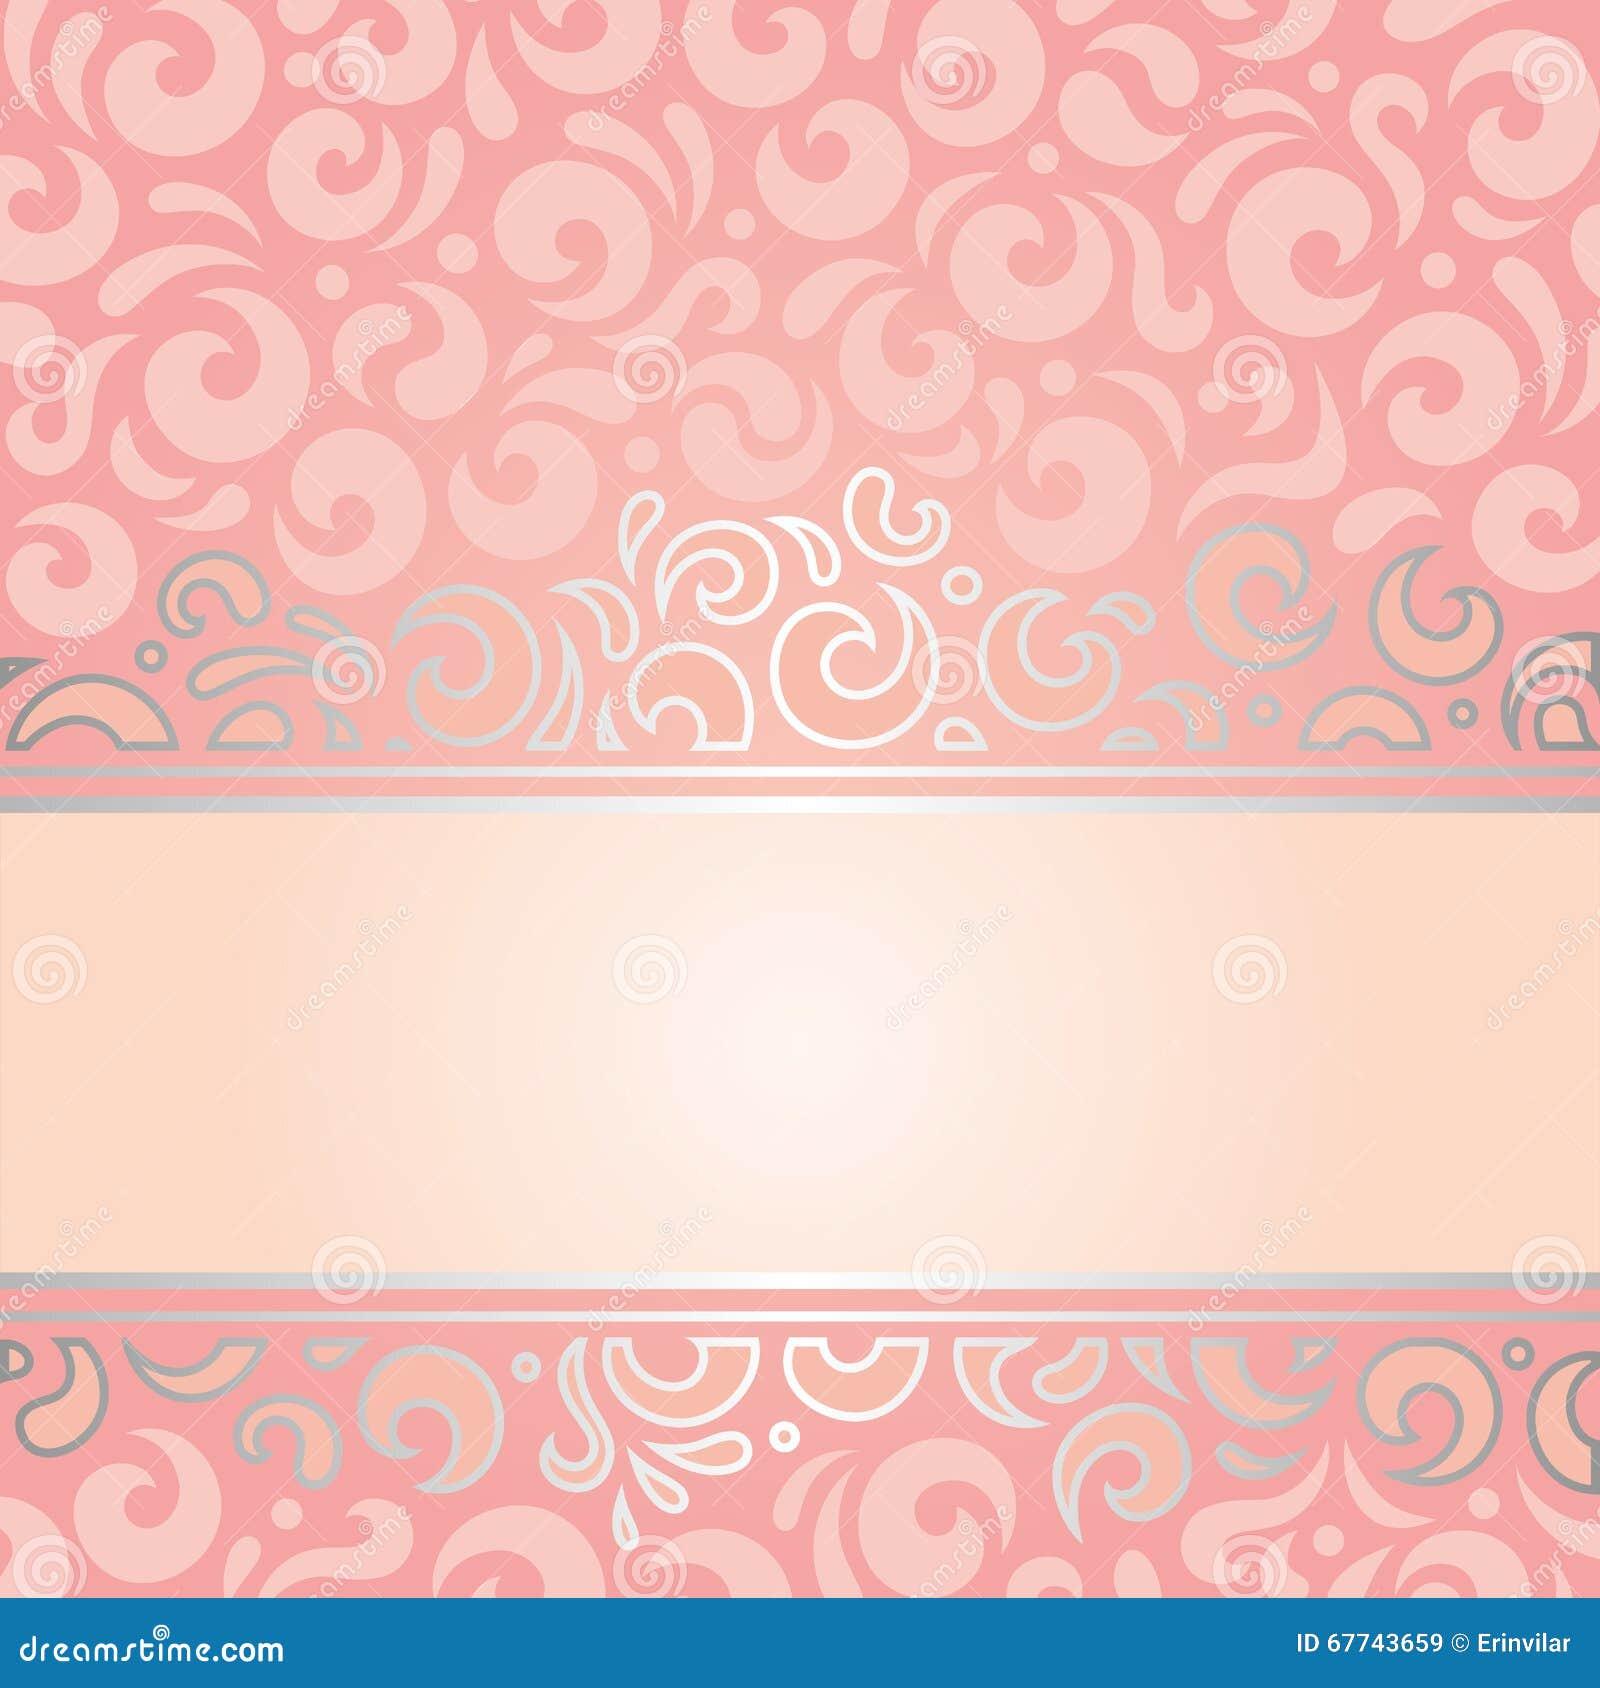 Retro Decorative Pink Silver Invitation Vintage Wallpaper